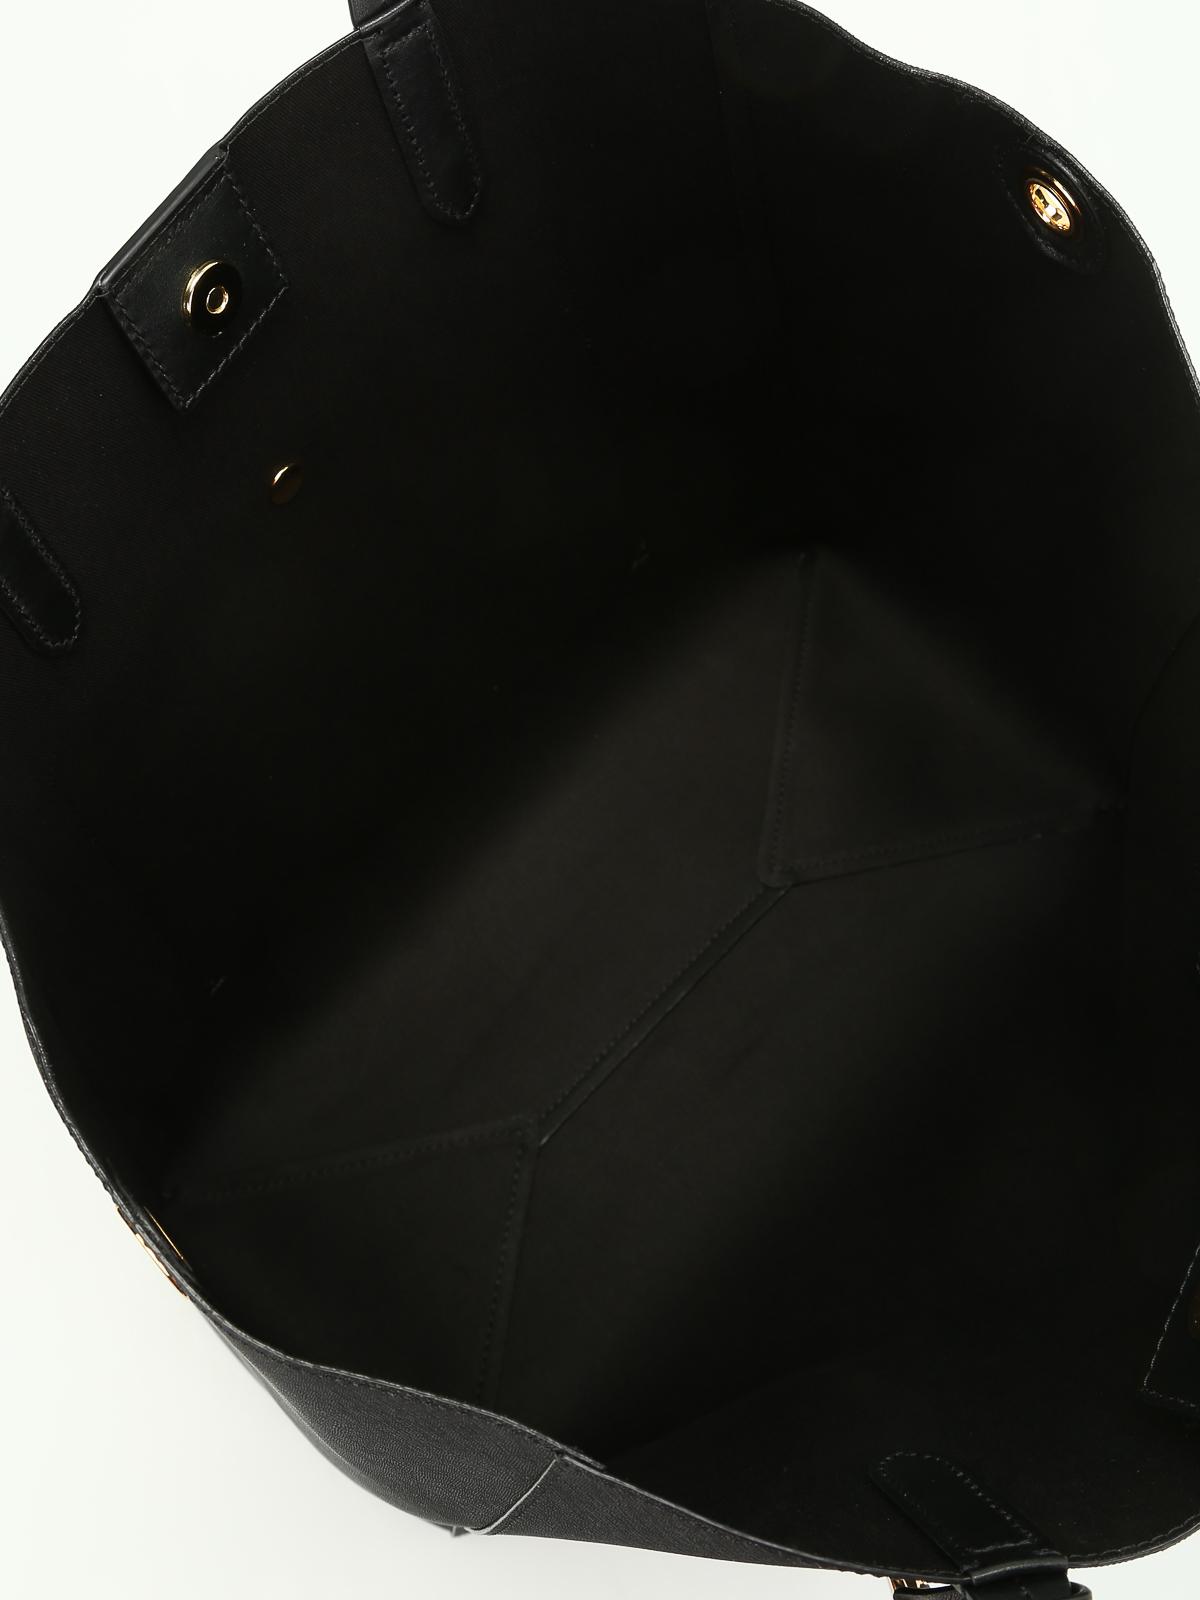 d23ec1e75466 Michael Kors - Penny coated twill convertible tote - totes bags ...